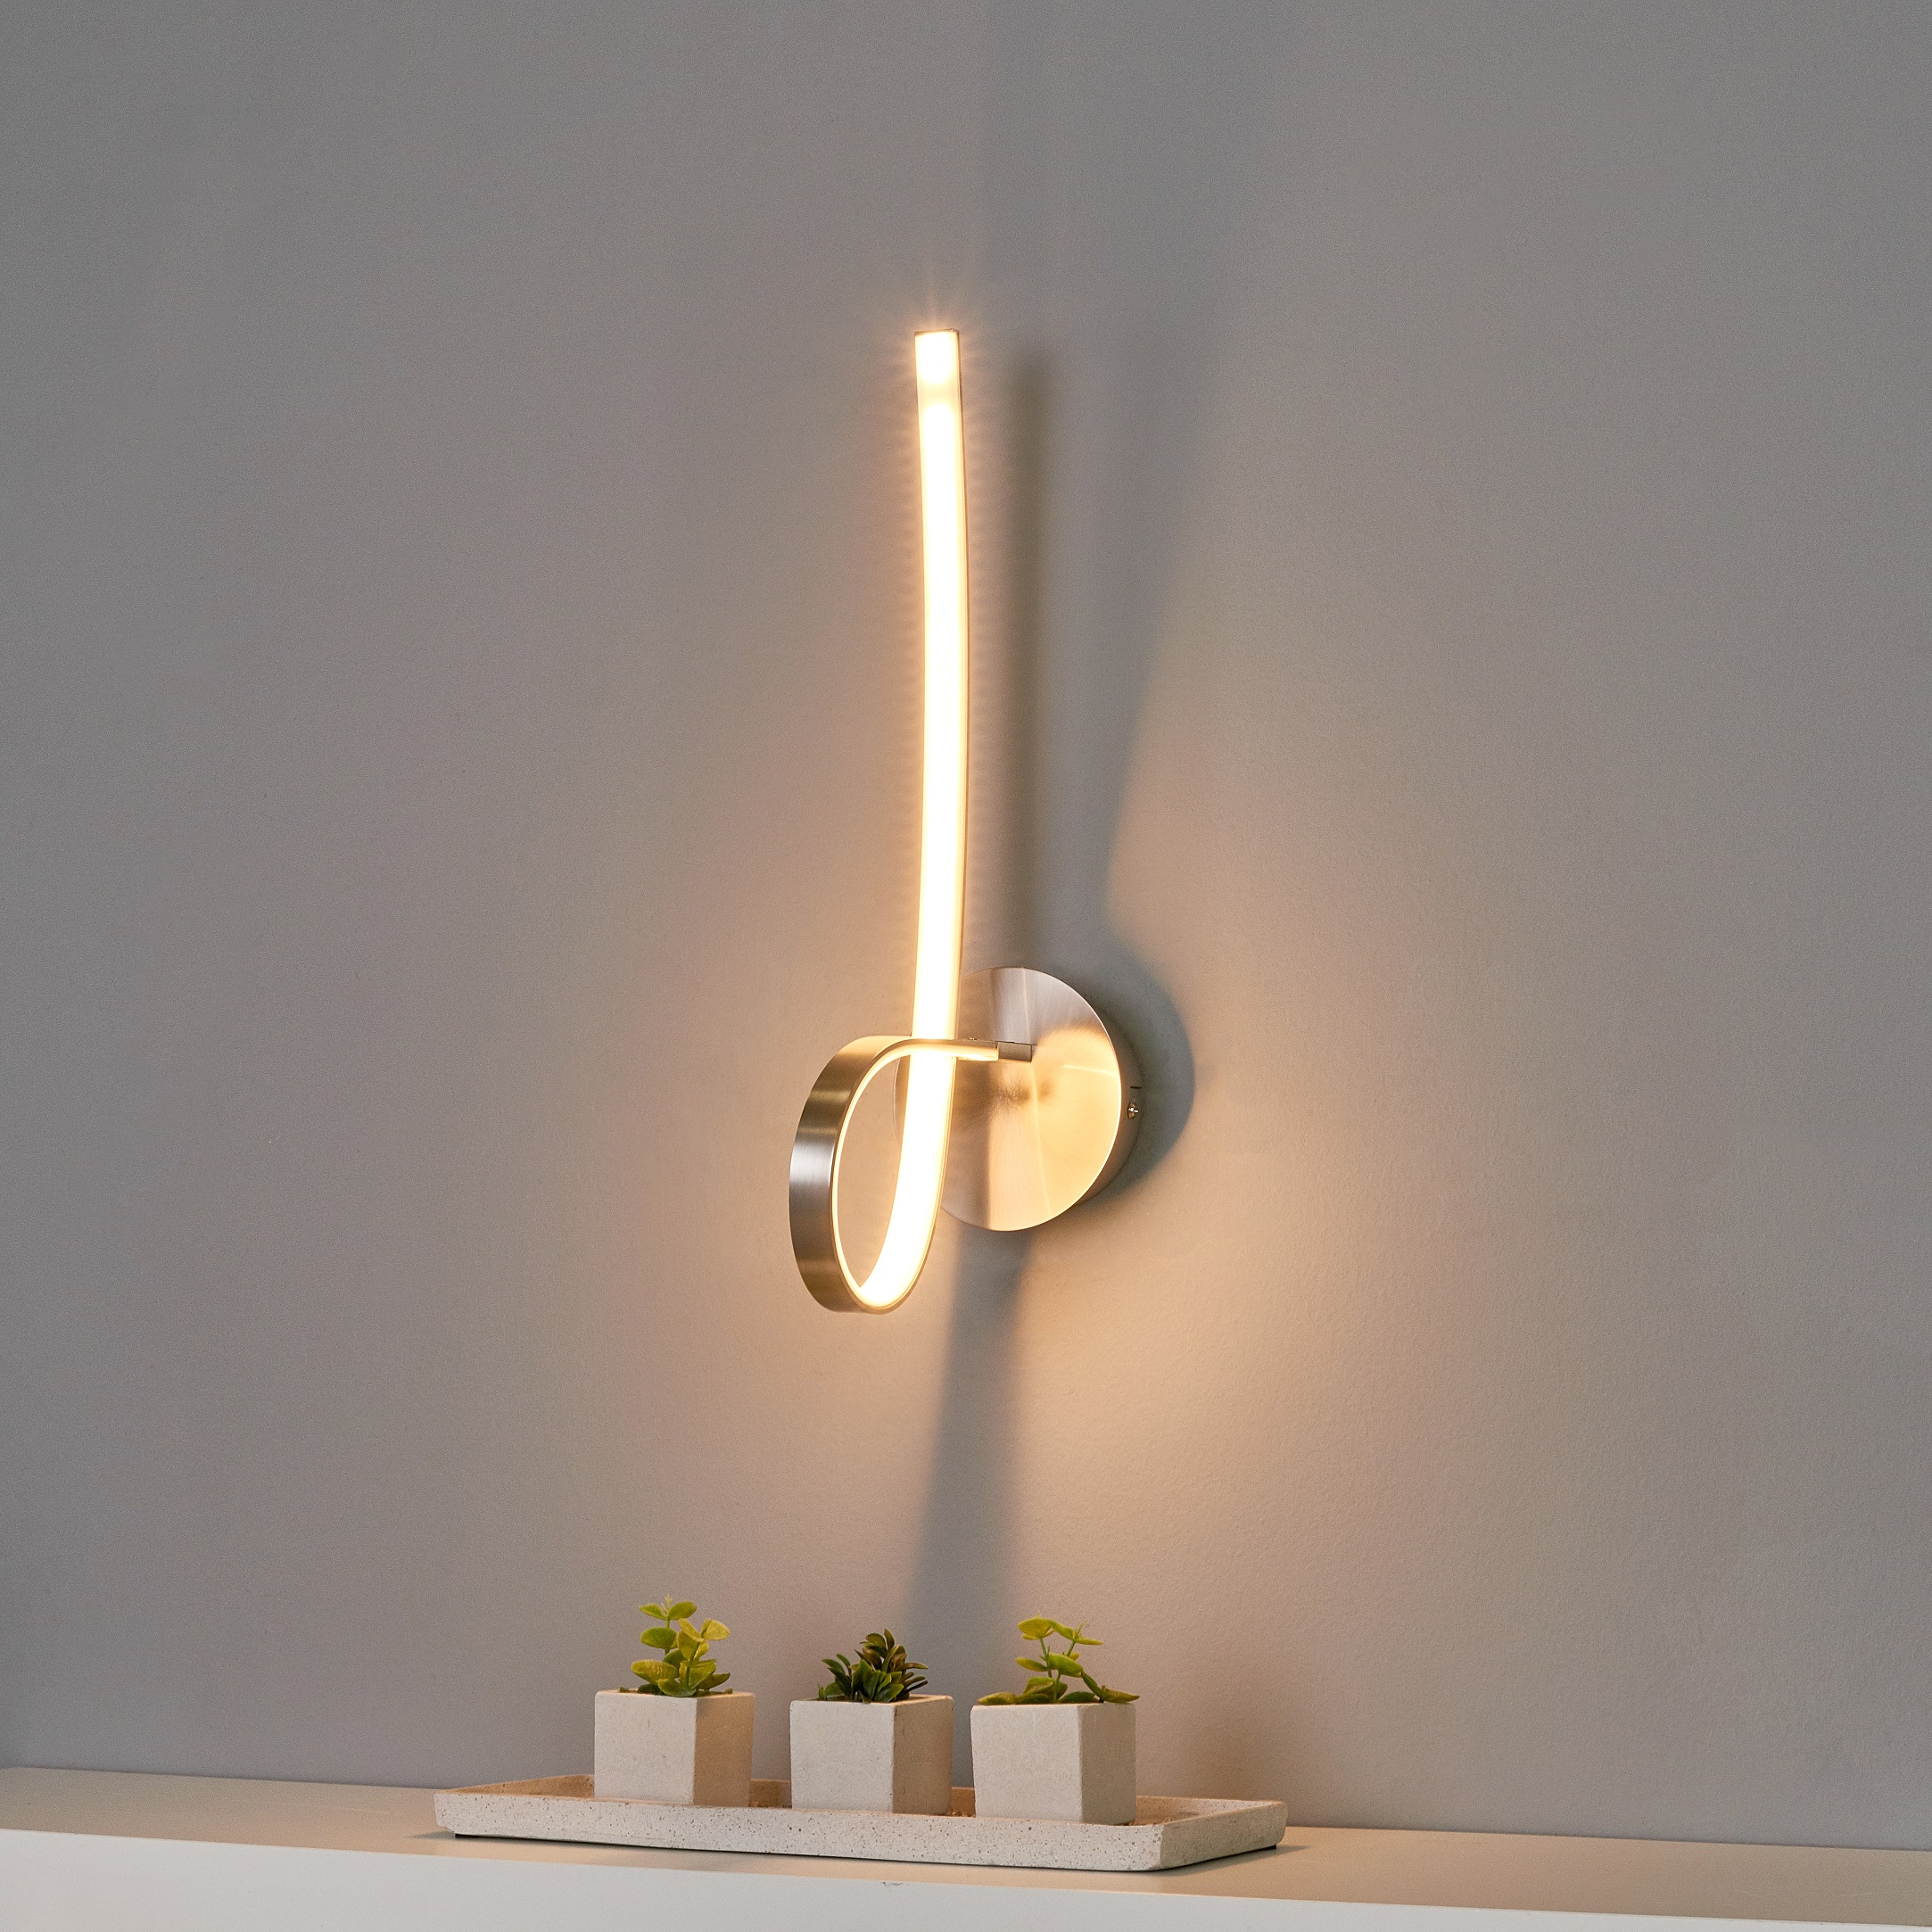 Lampadari Per Casa Al Mare i punti luce nella zona pranzo: scelta oculata - cucina & svago